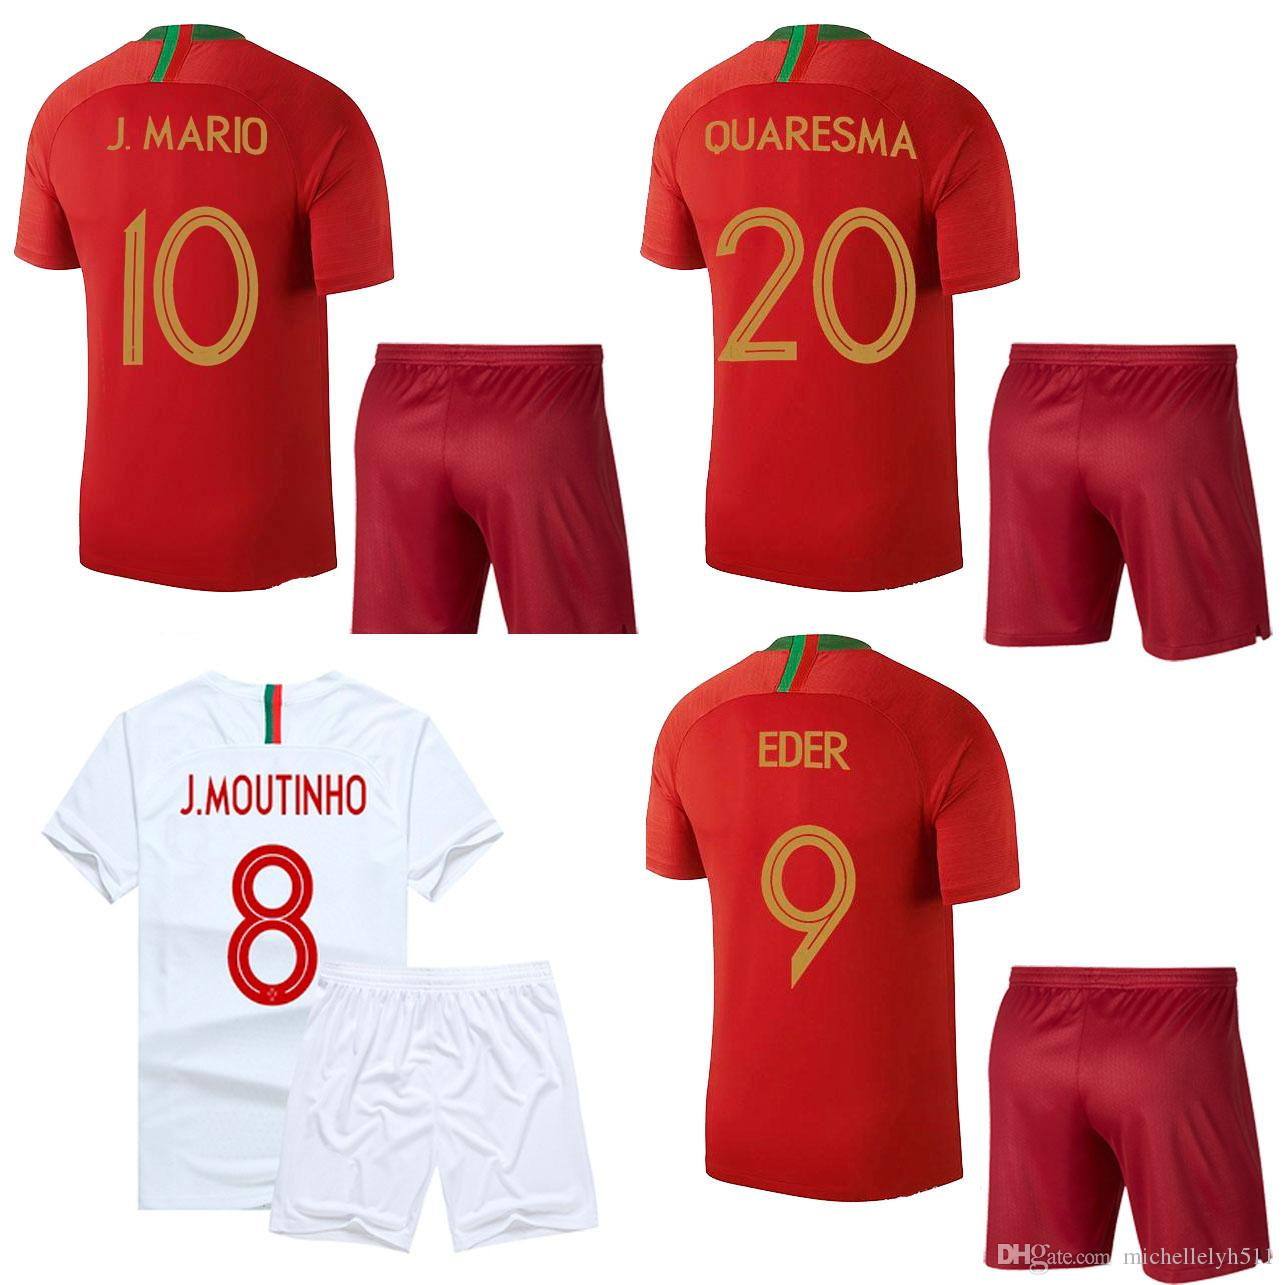 2018 2019 MOUTINHO Camiseta De Fútbol Shorts Copa Del Mundo 2018 Equipo  Nacional De Fútbol Kits QUARESMA ANDRE SILVA Manga Corta De Adulto Uniforme  ... 2d132279039cb